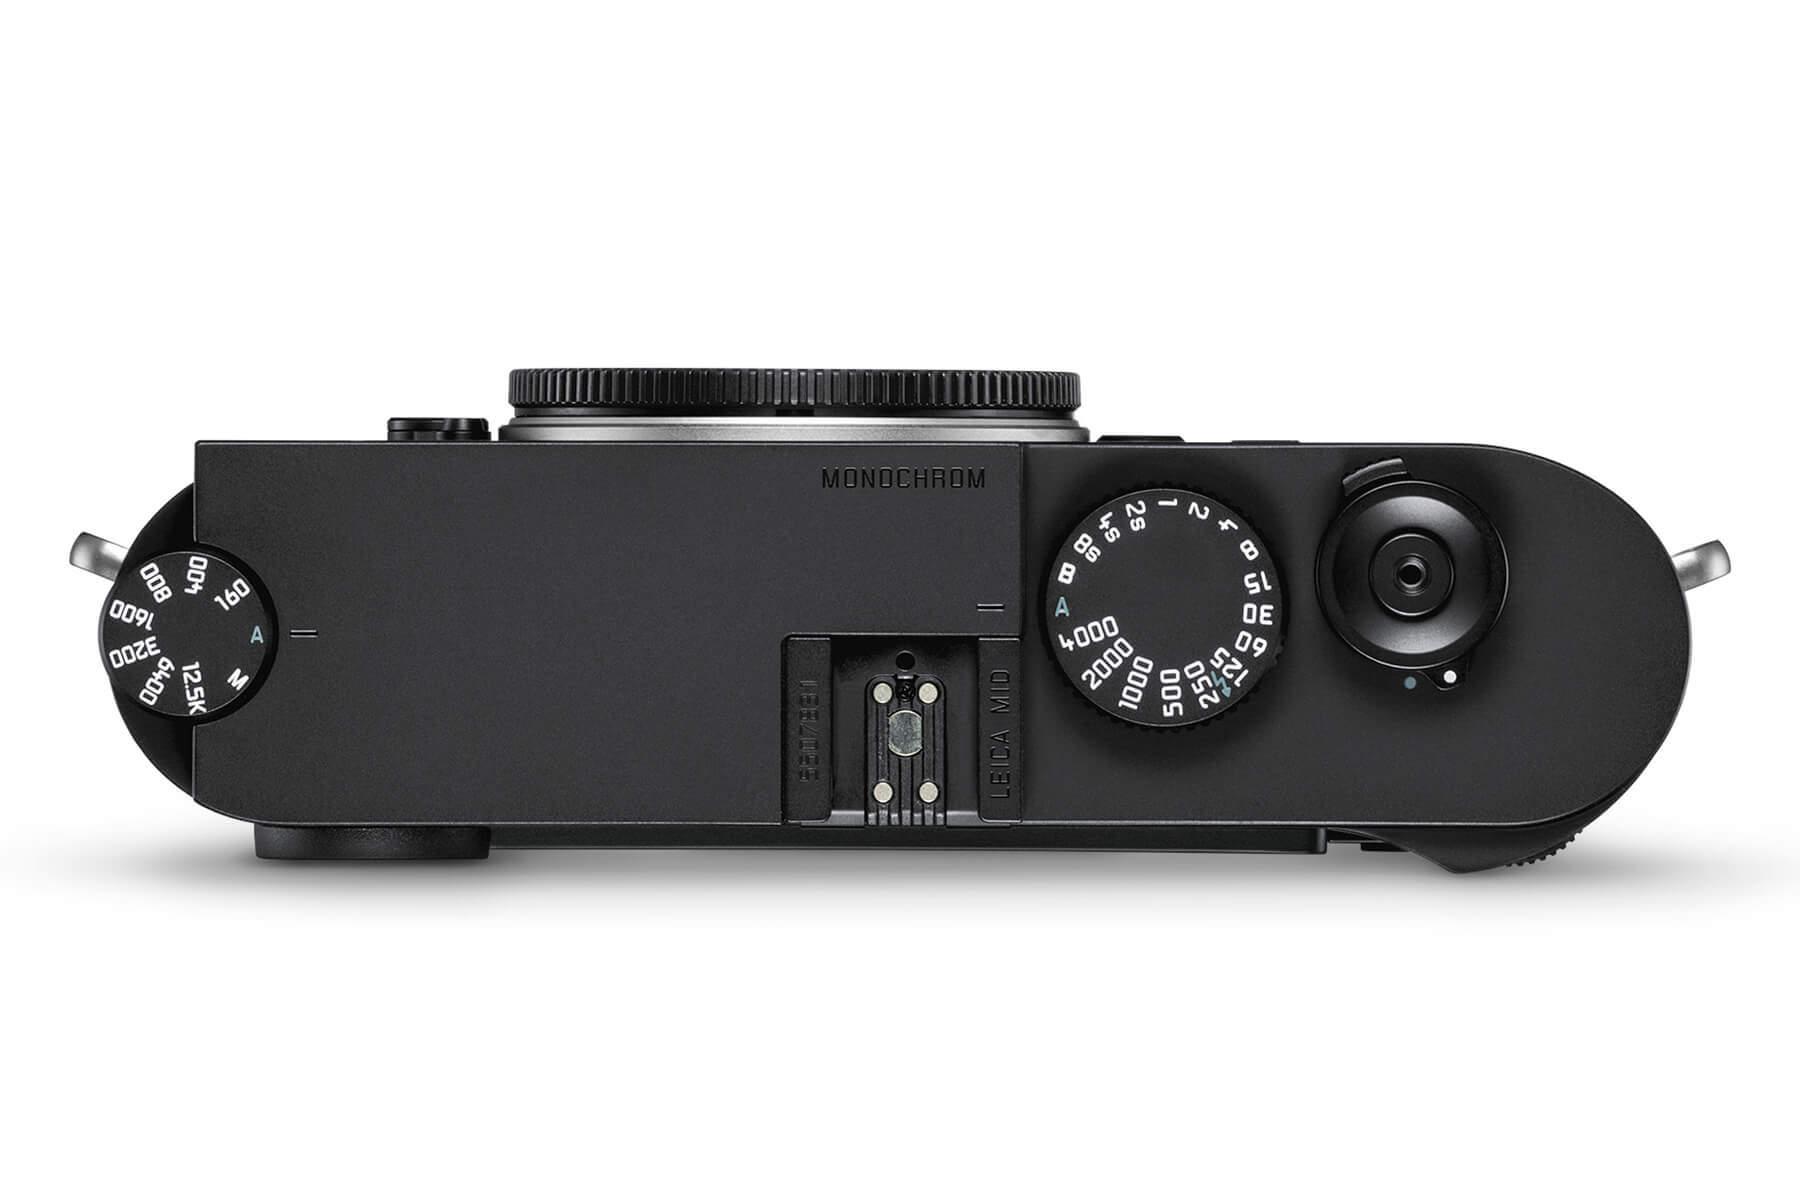 Leica M10 Monochrom top